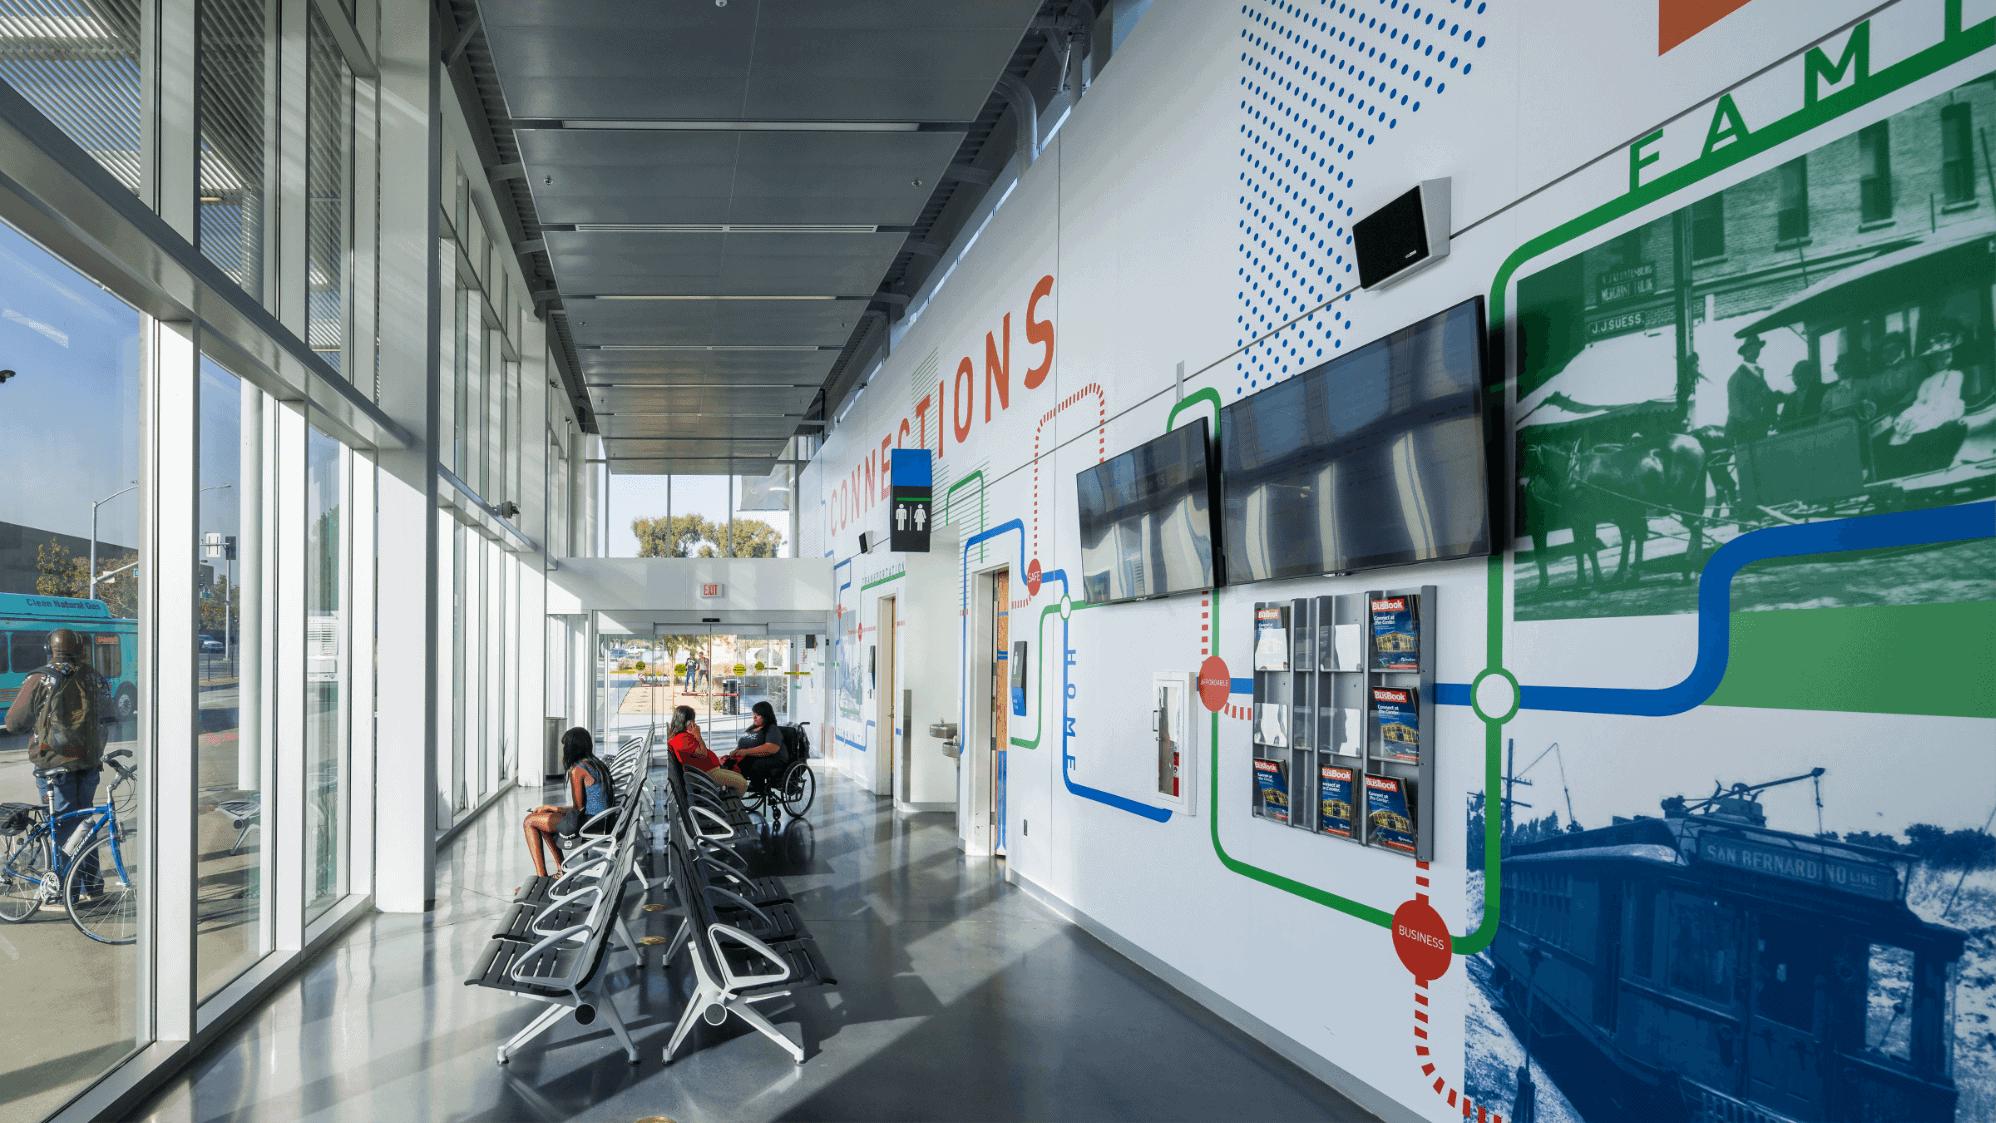 Image of San Bernardino Transit Center interior